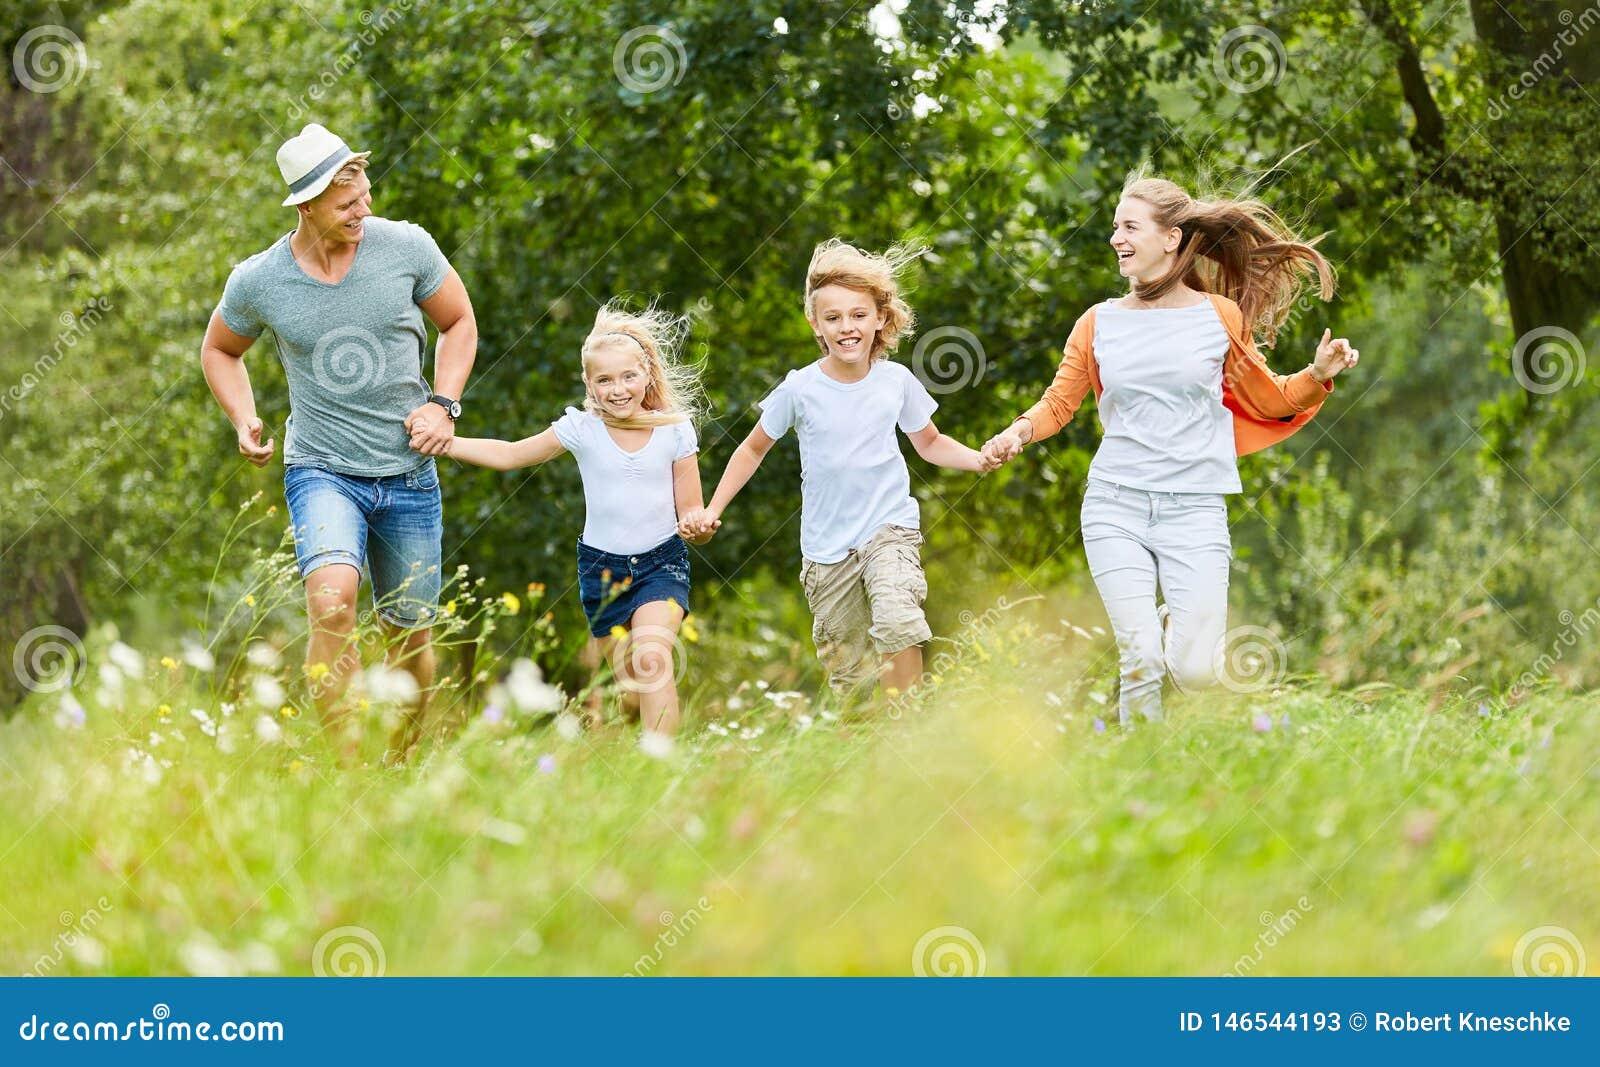 Family and children run in nature